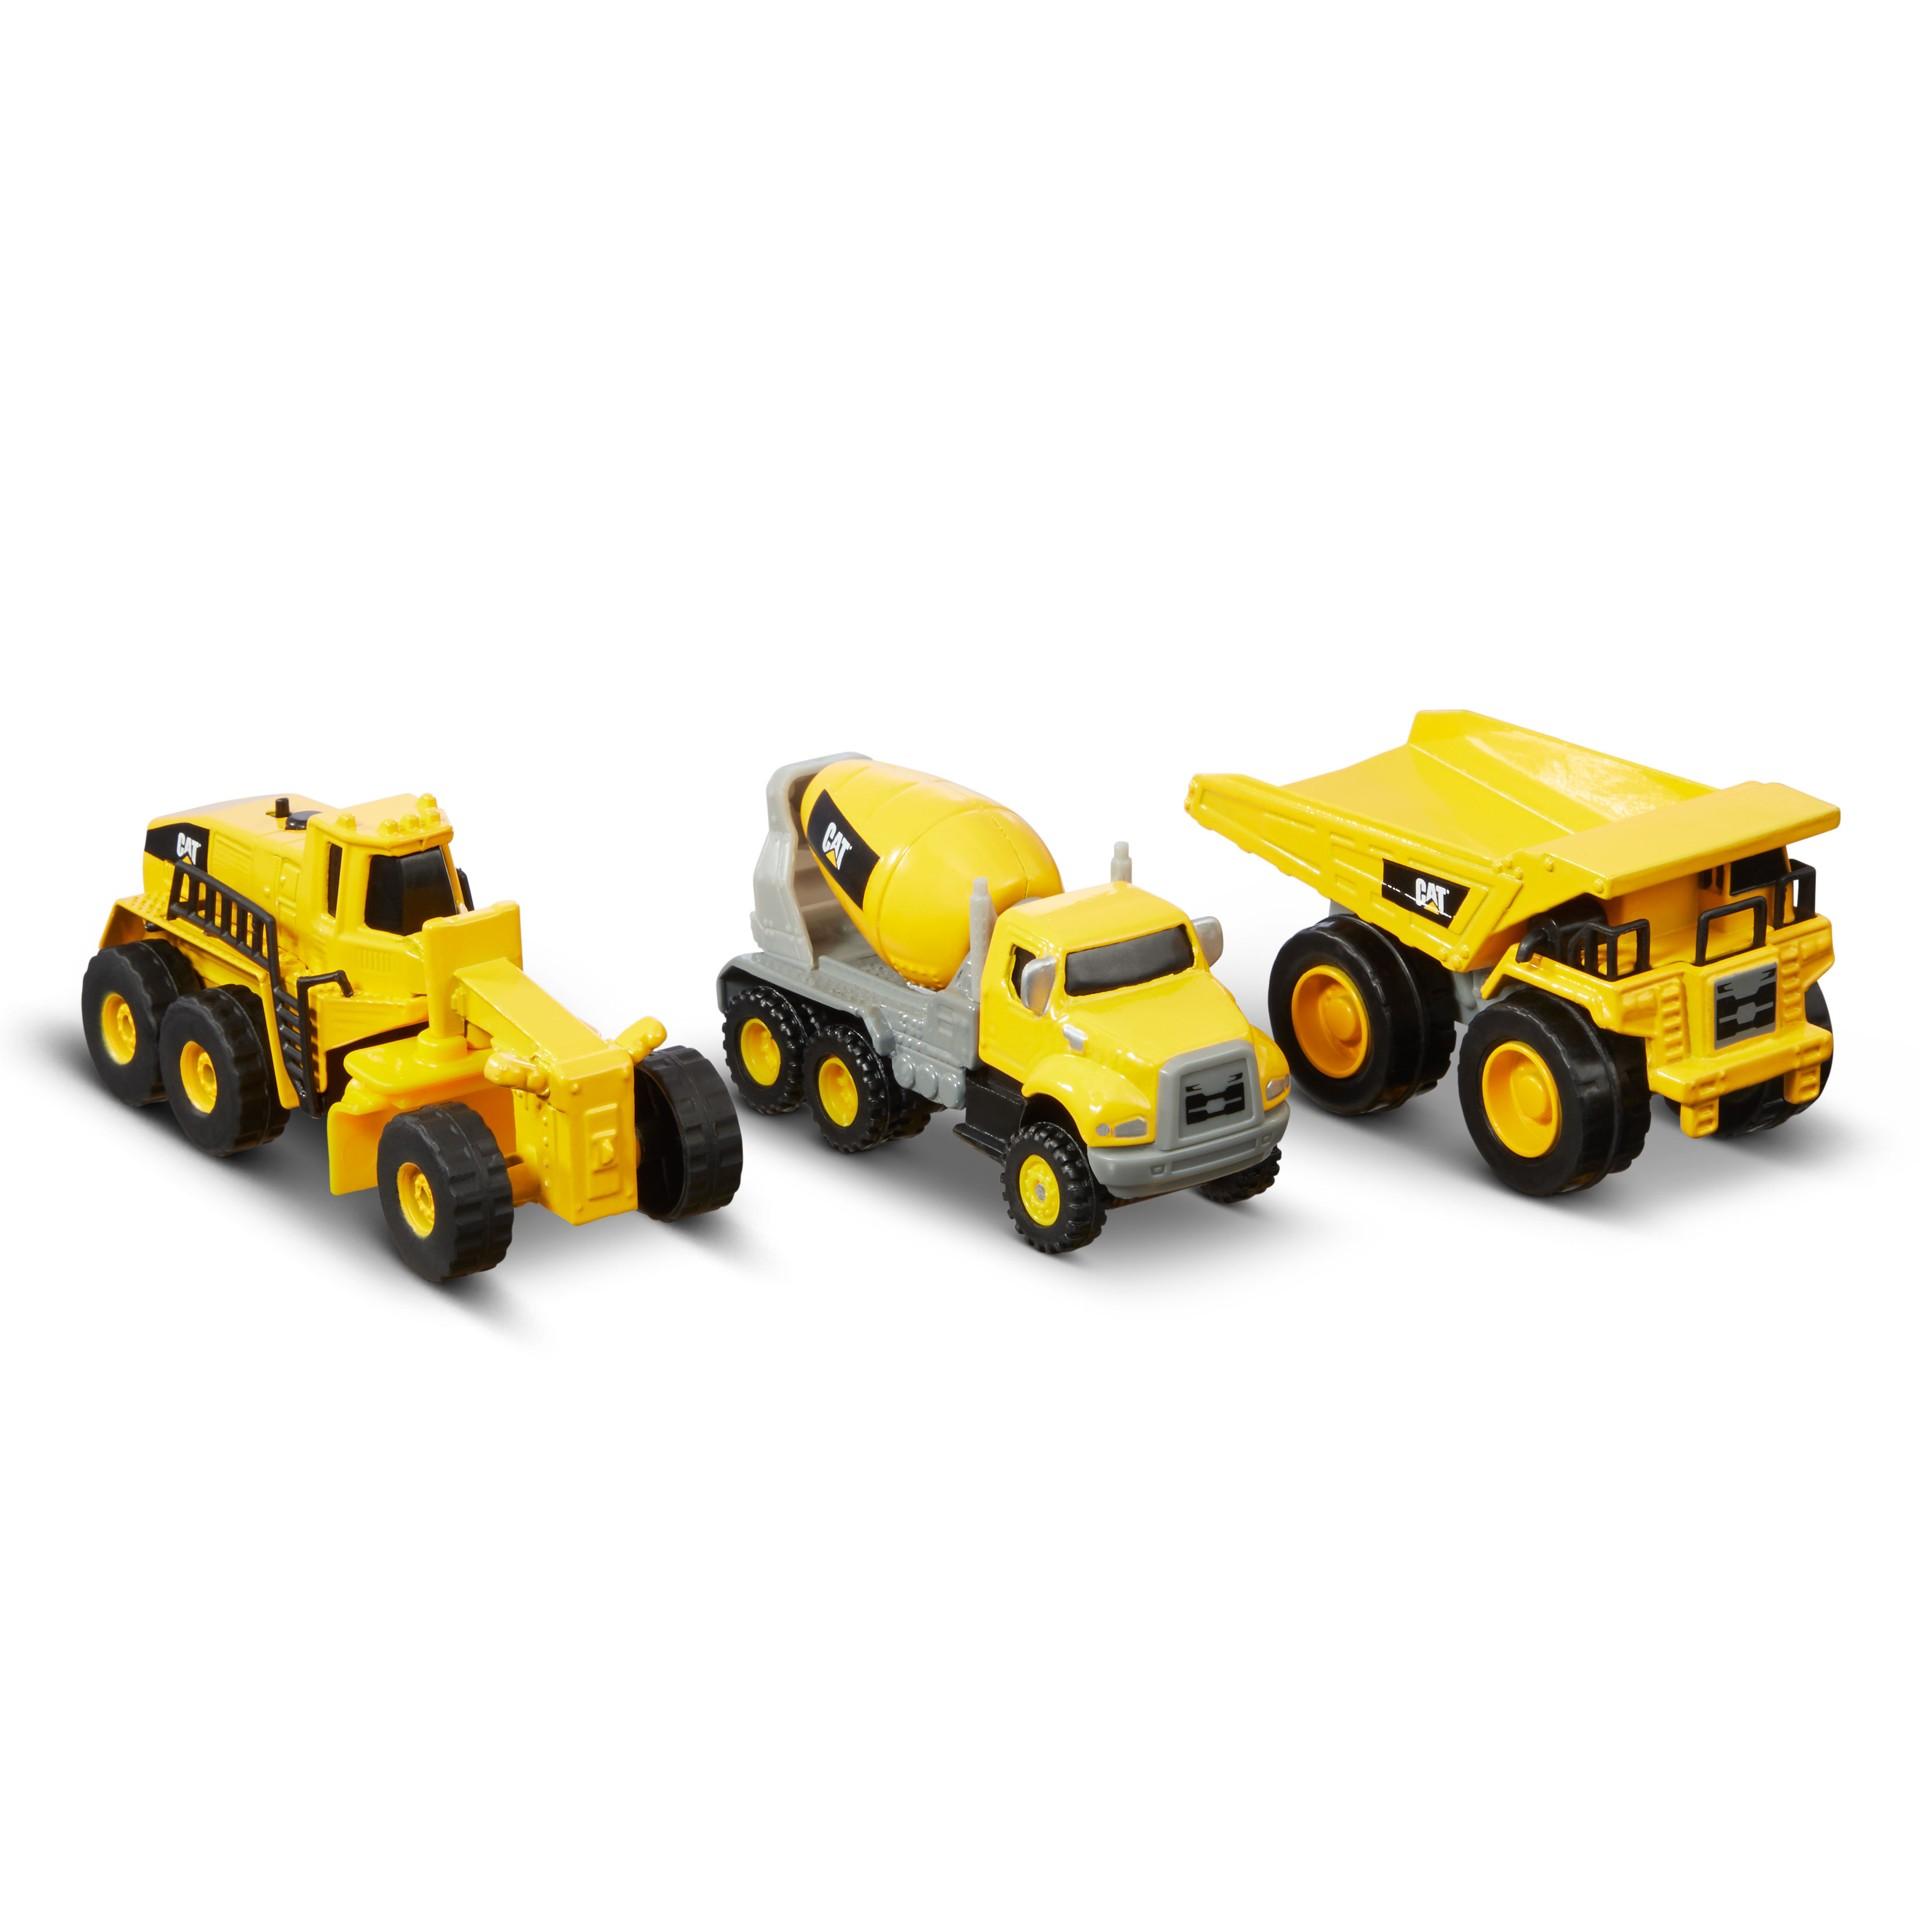 Cat - Metal 3-Pack Concrete Mixer, Dump Truck, Grader (82273)